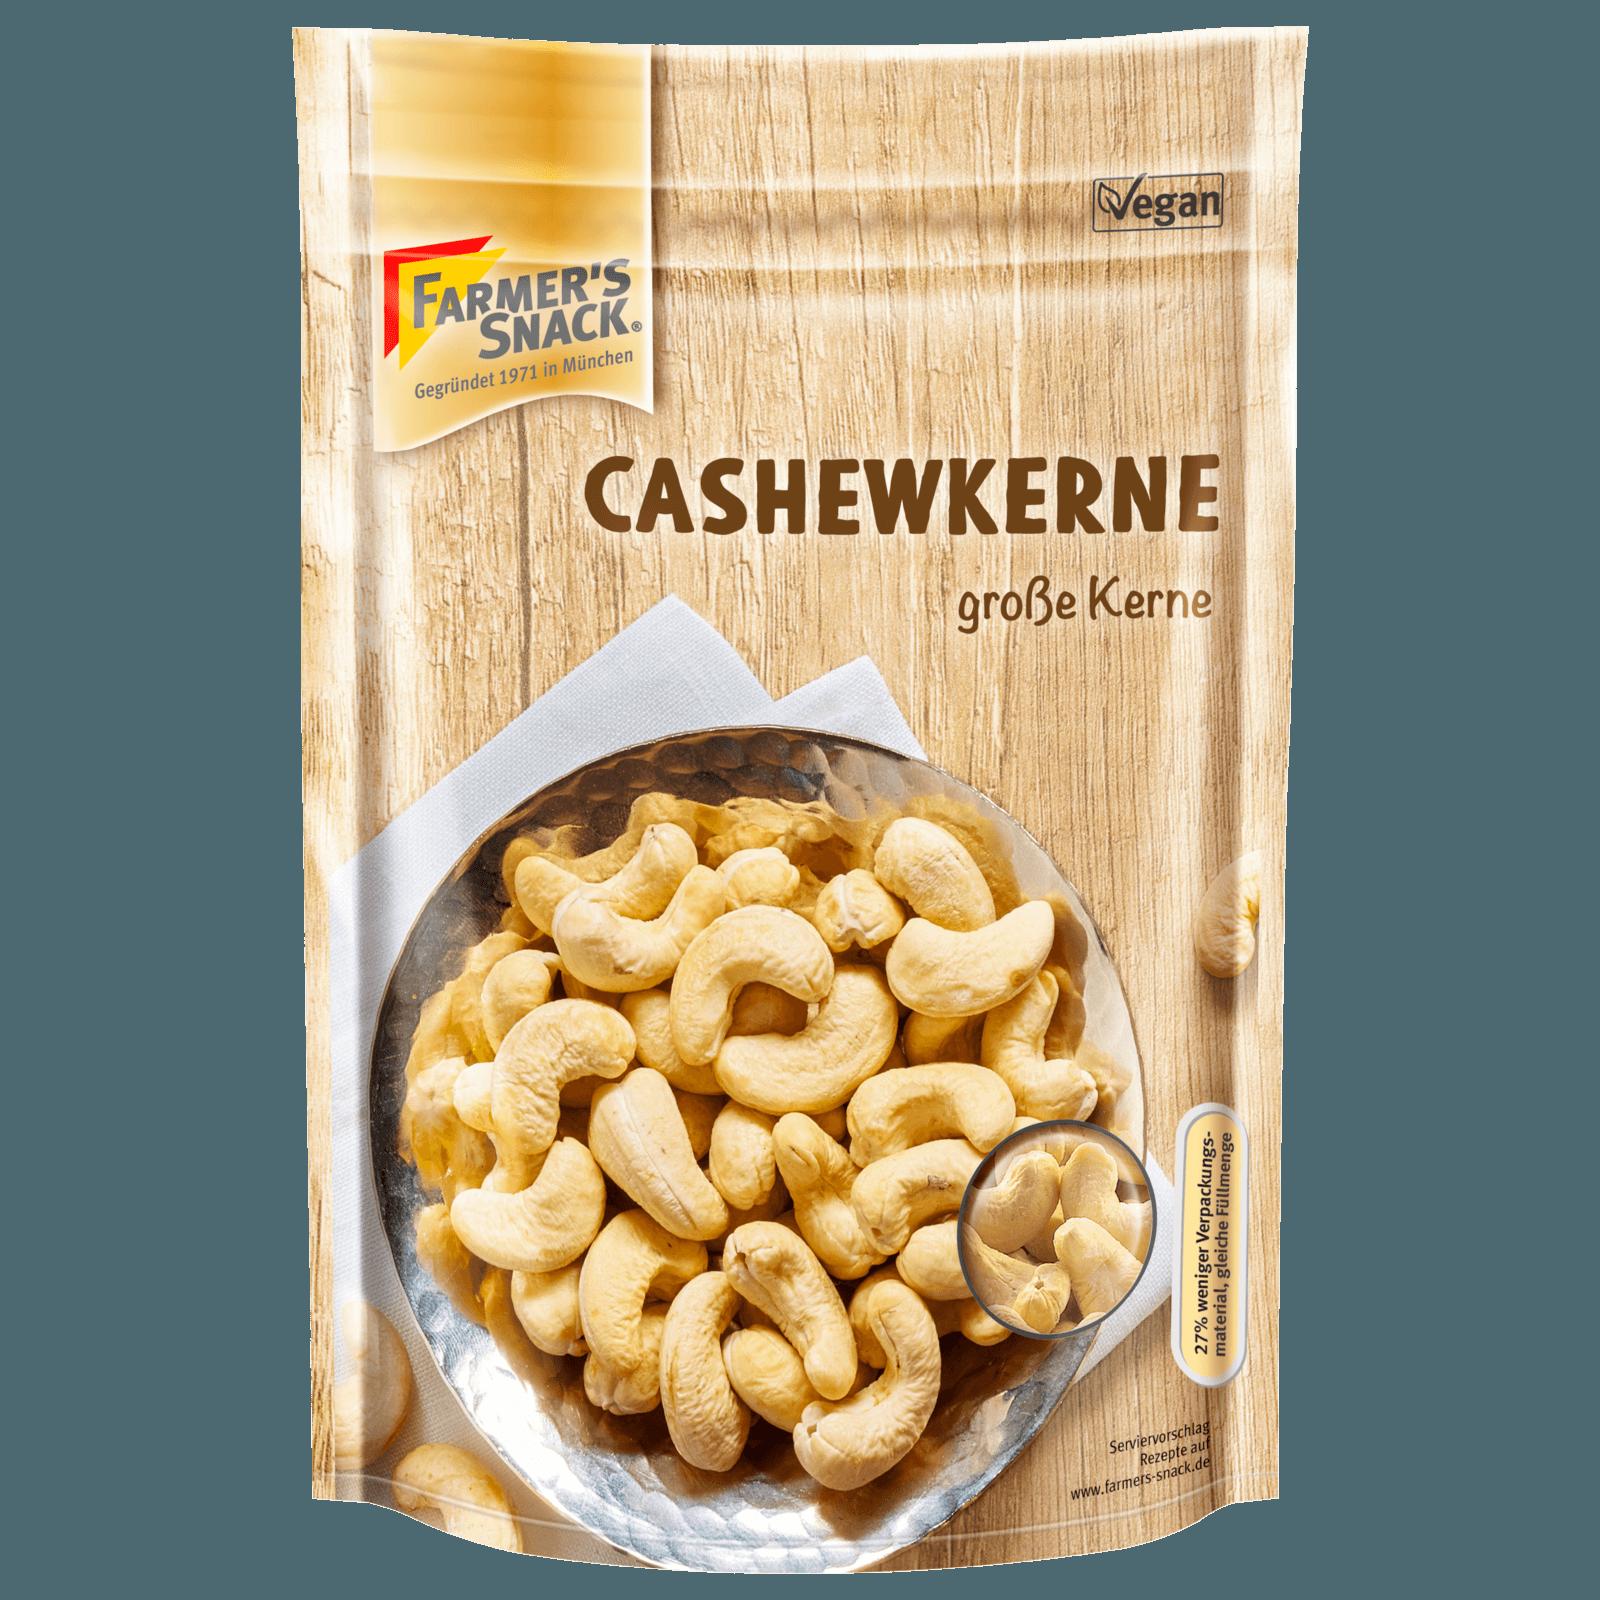 Farmer's Snack Cashewkerne 175g